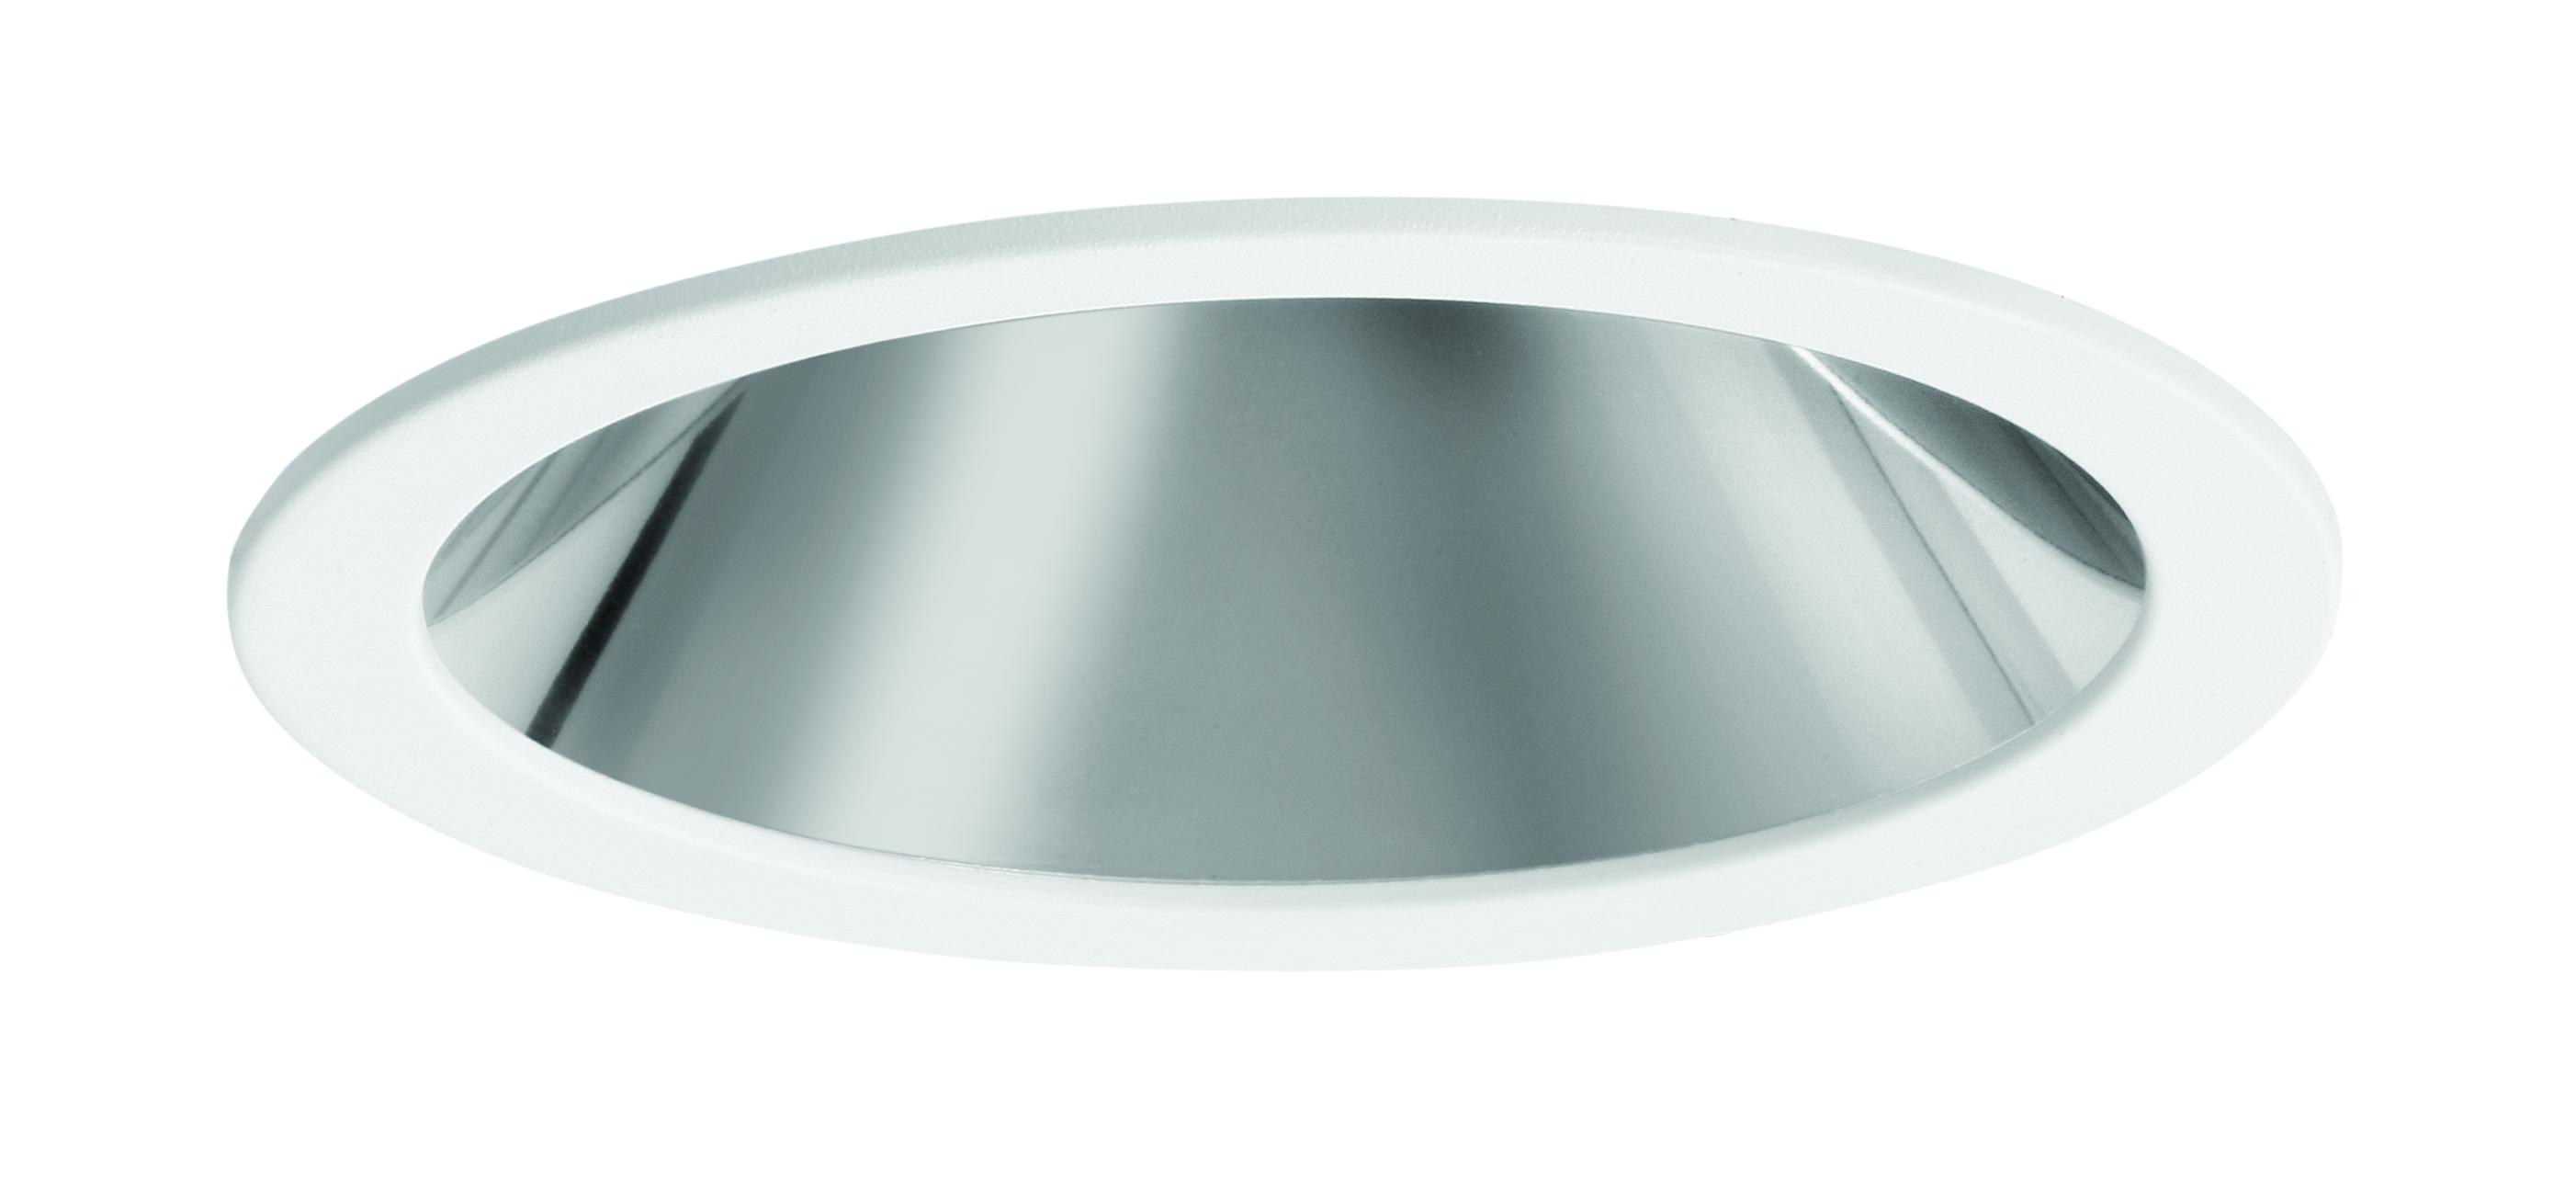 1 Stk Kain LED Downlight 32W 3000K 2350lm, 62°, DIM 1-10V, RAL9003 LI99000528